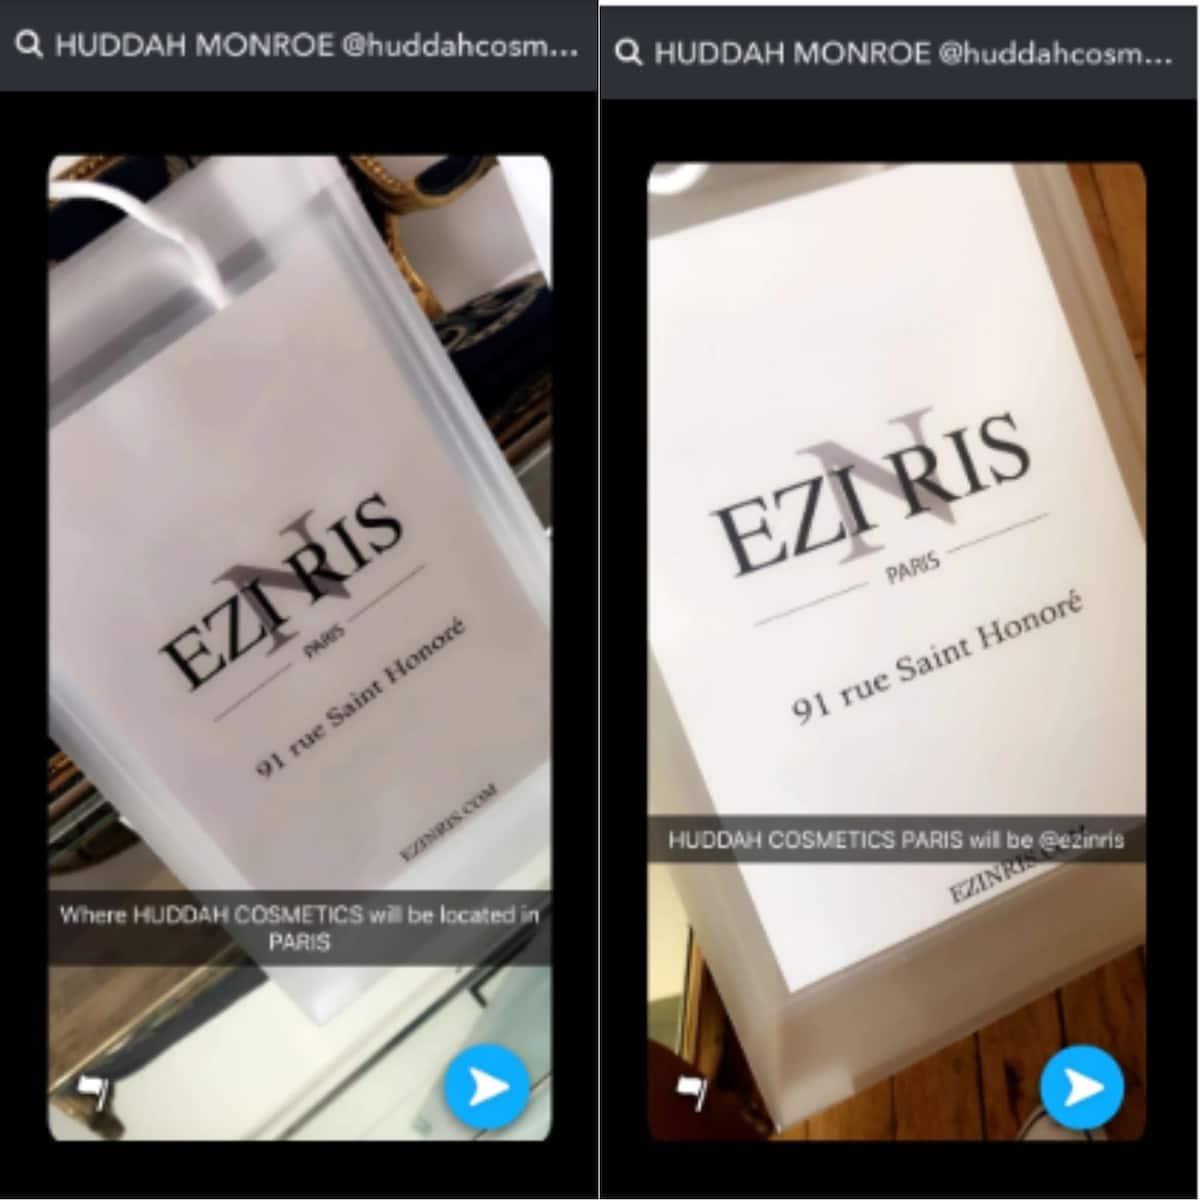 Money moves! Socialite Huddah Monroe to open new makeup stores in Paris